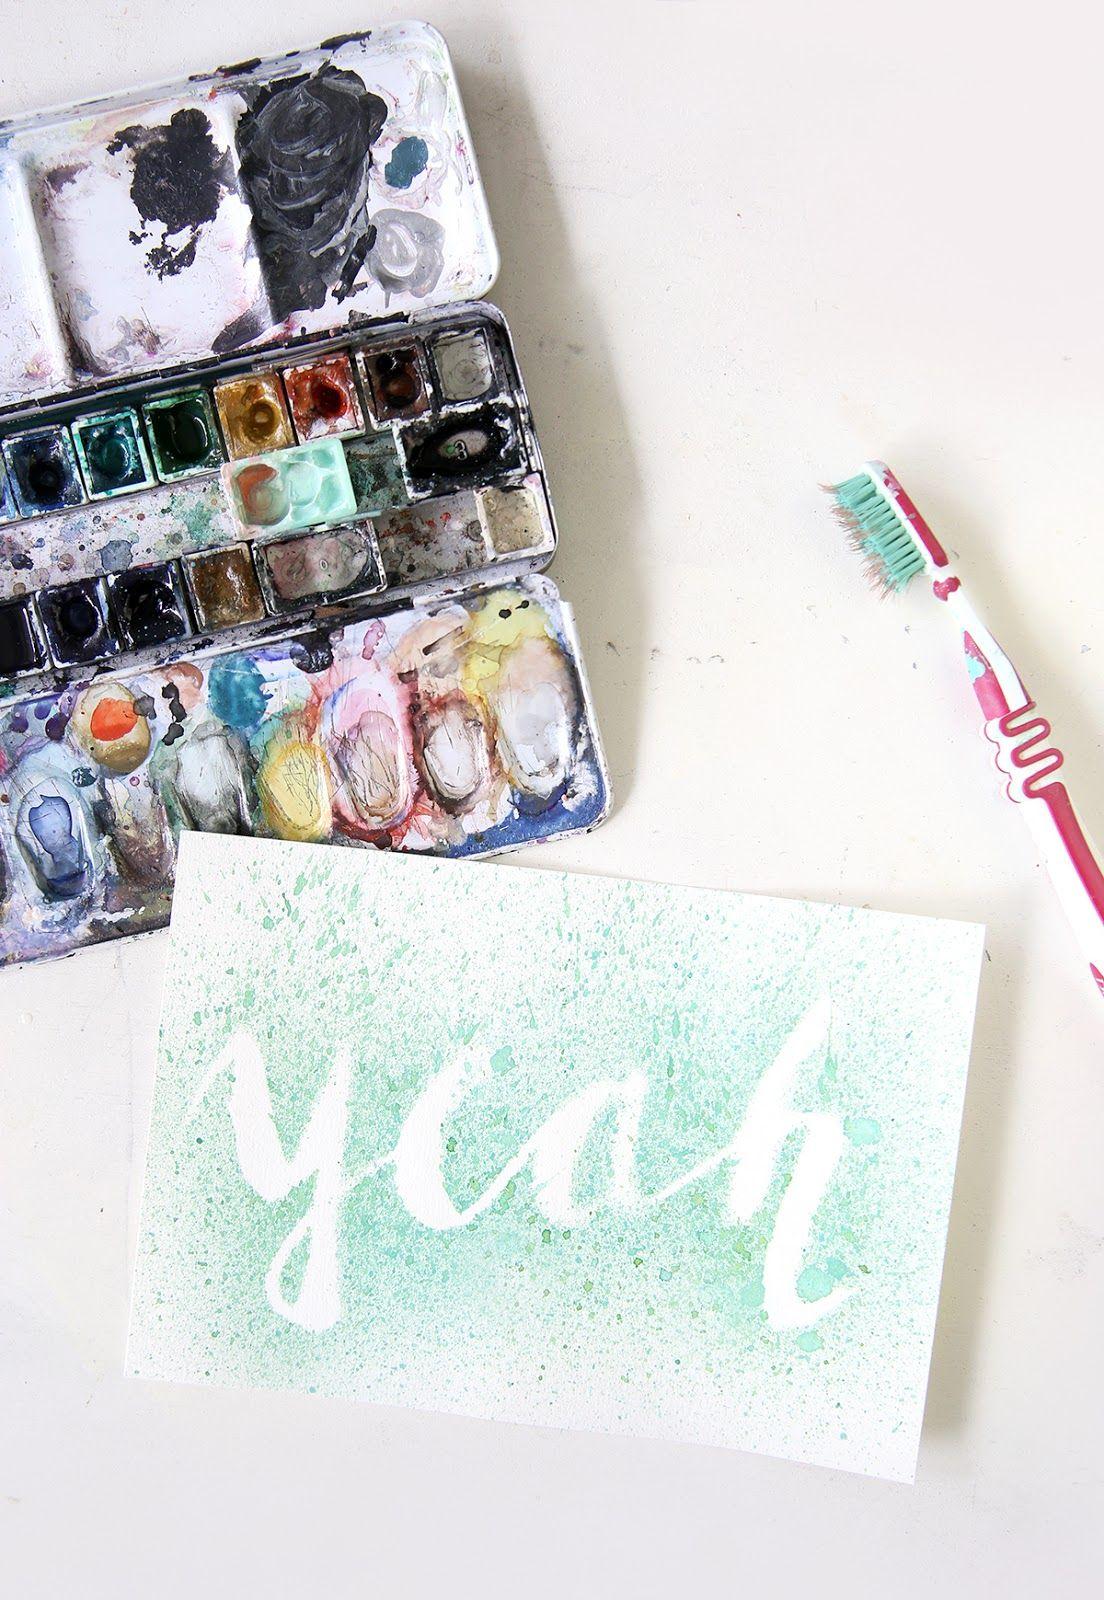 Diy Lettering Sprenkelbild Mit Wasserfarbe Diy Kreative Ideen